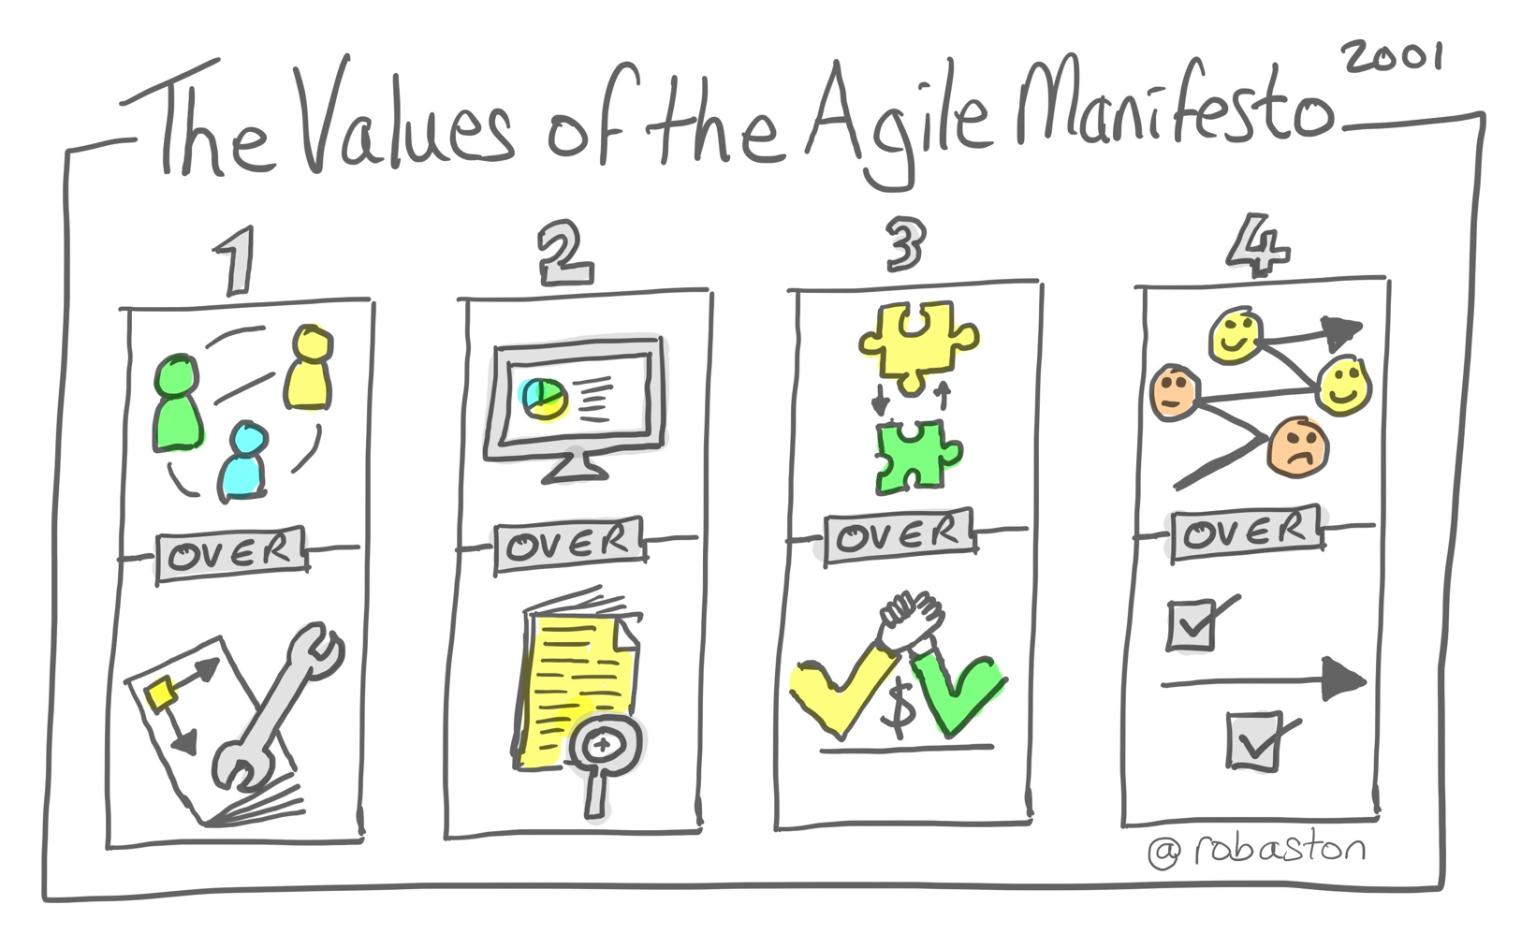 Without words – visual Agile Manifesto Values